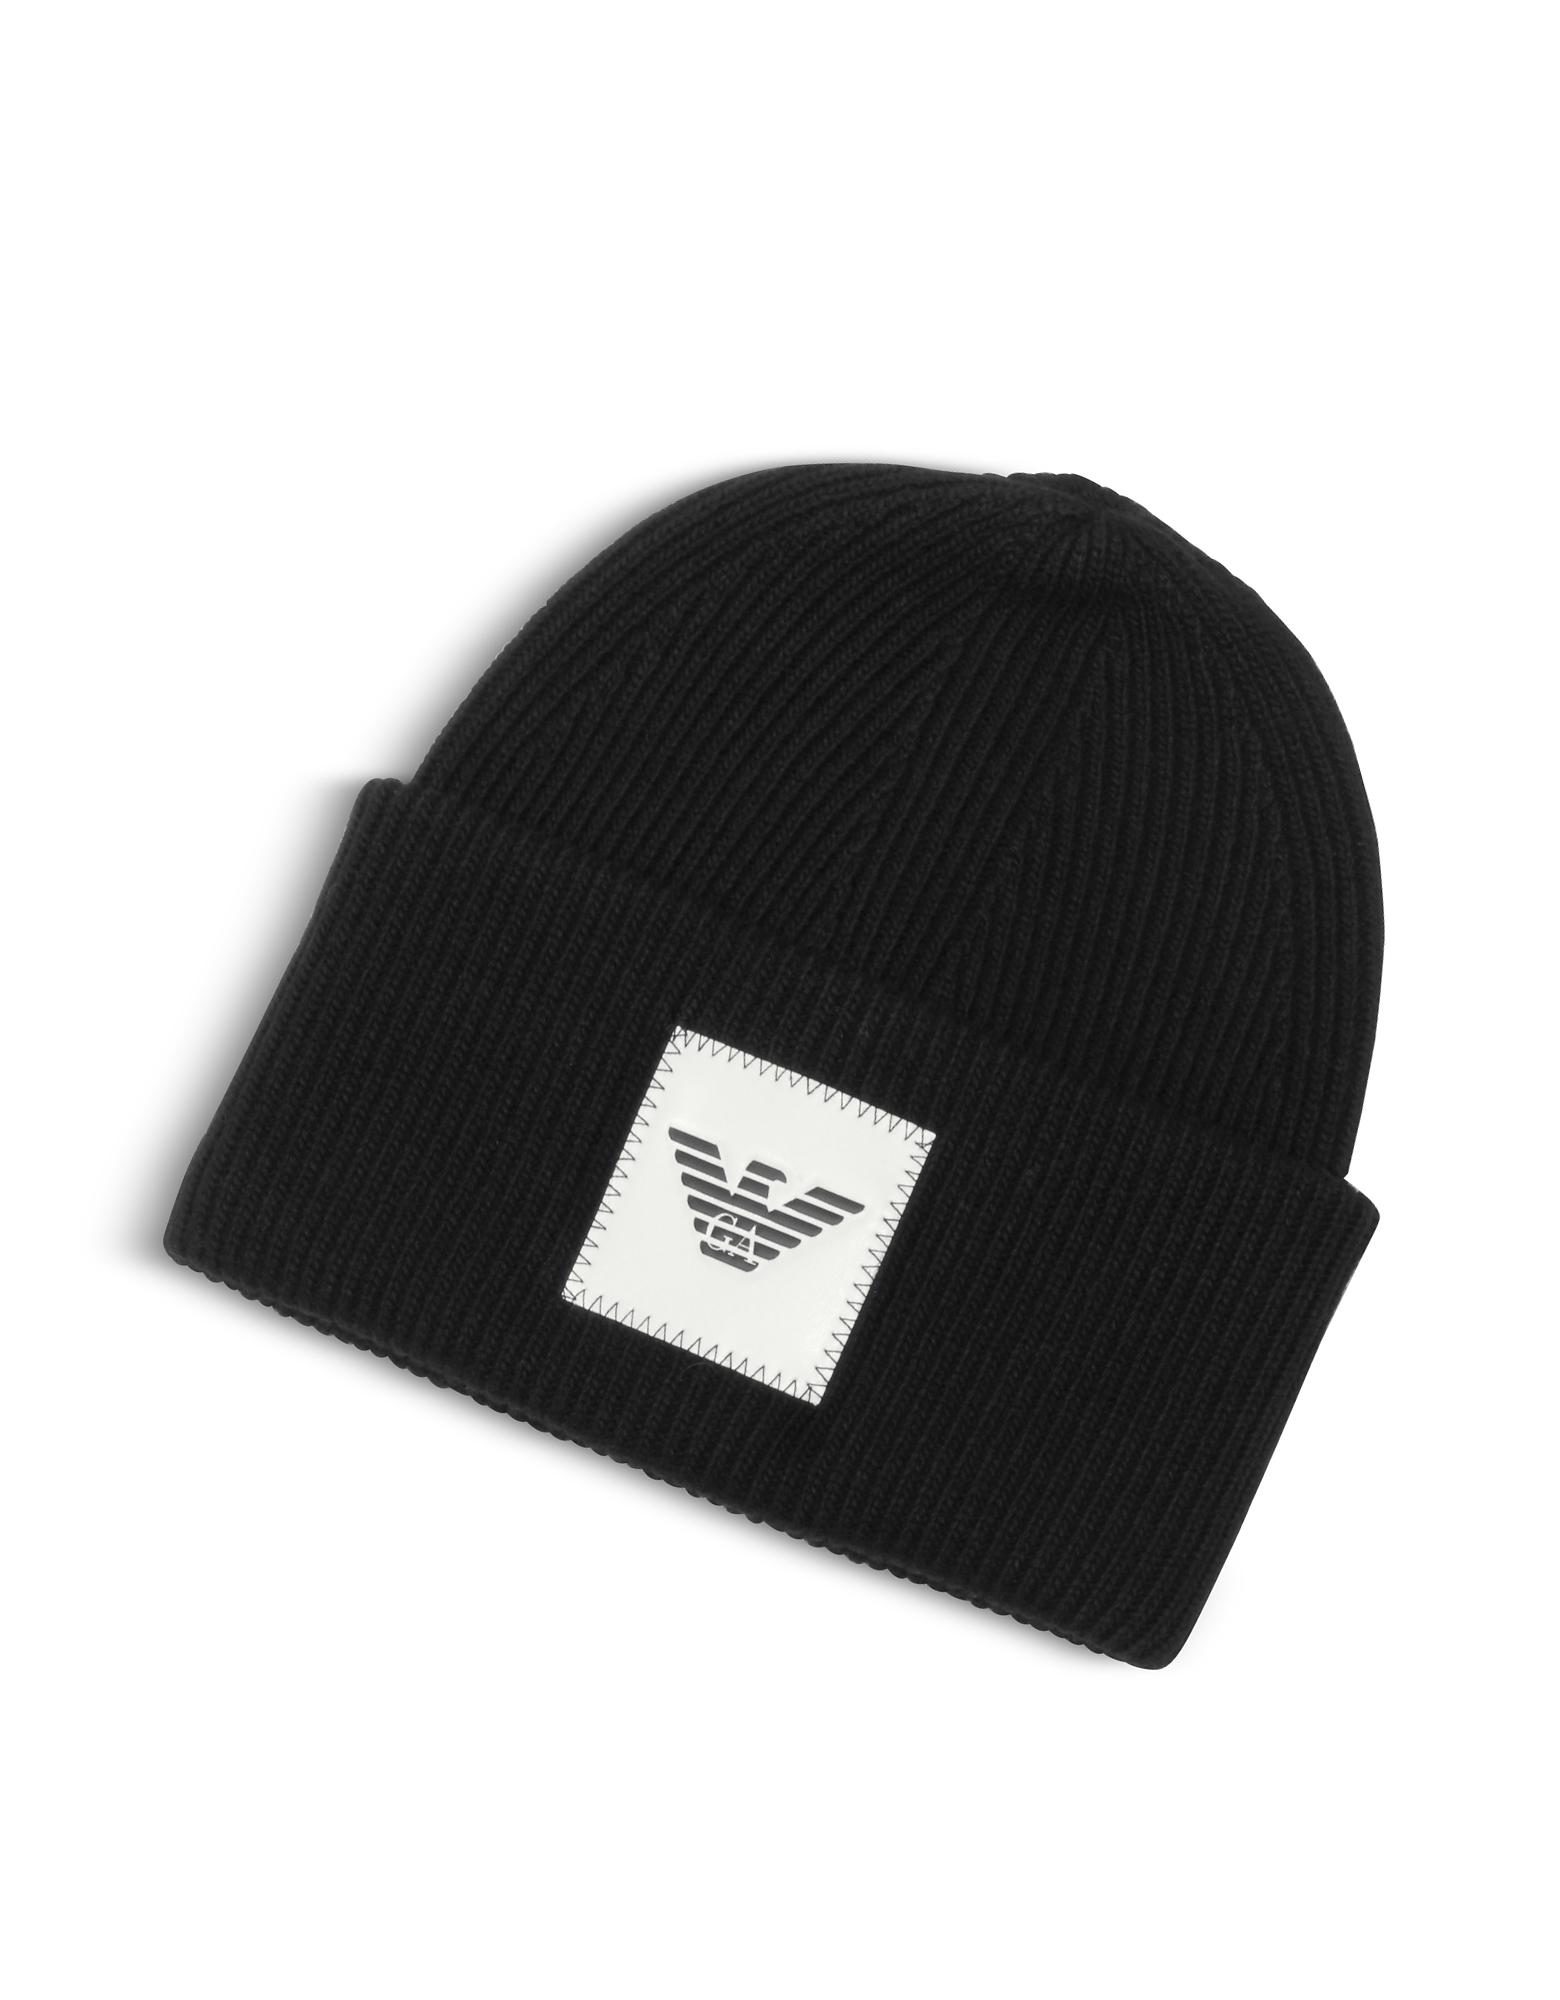 Black EA Beanie Hat